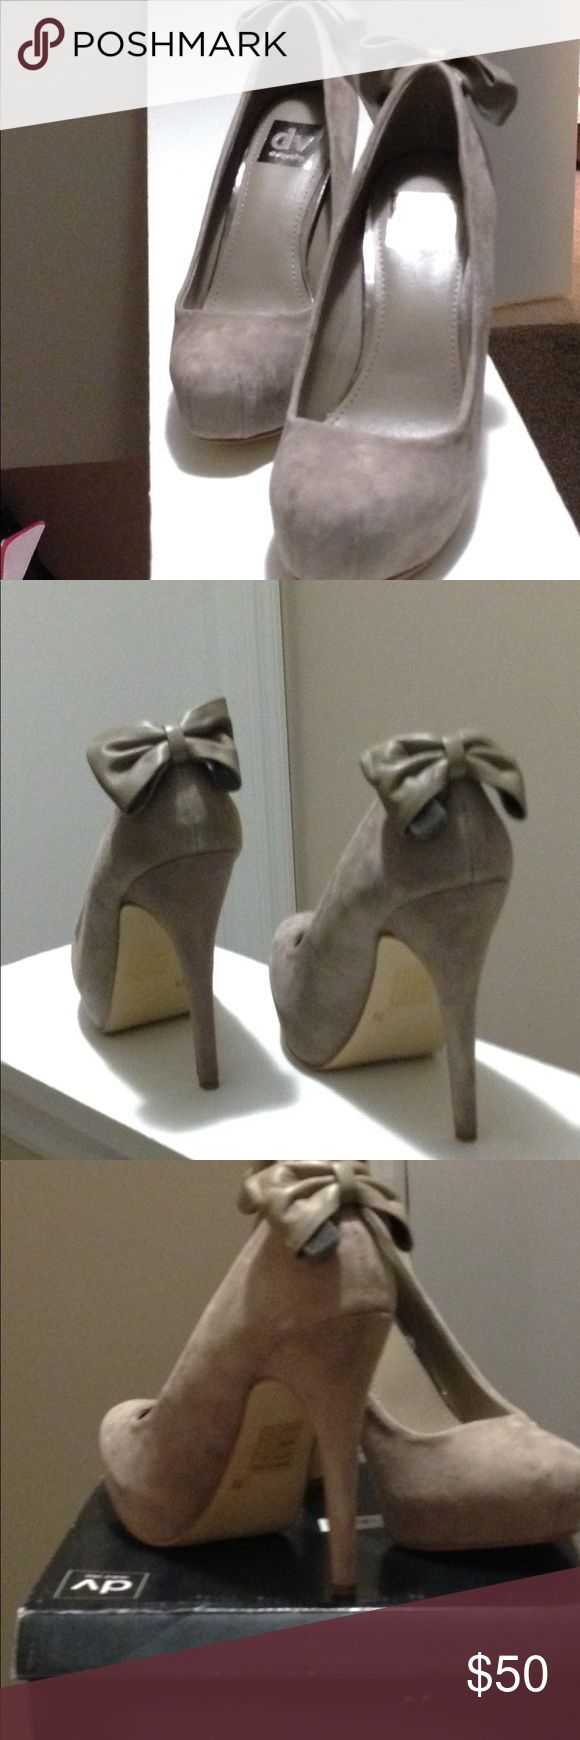 New suede pumps Taupe suede platform pumps never worn in original box Shoes Heels